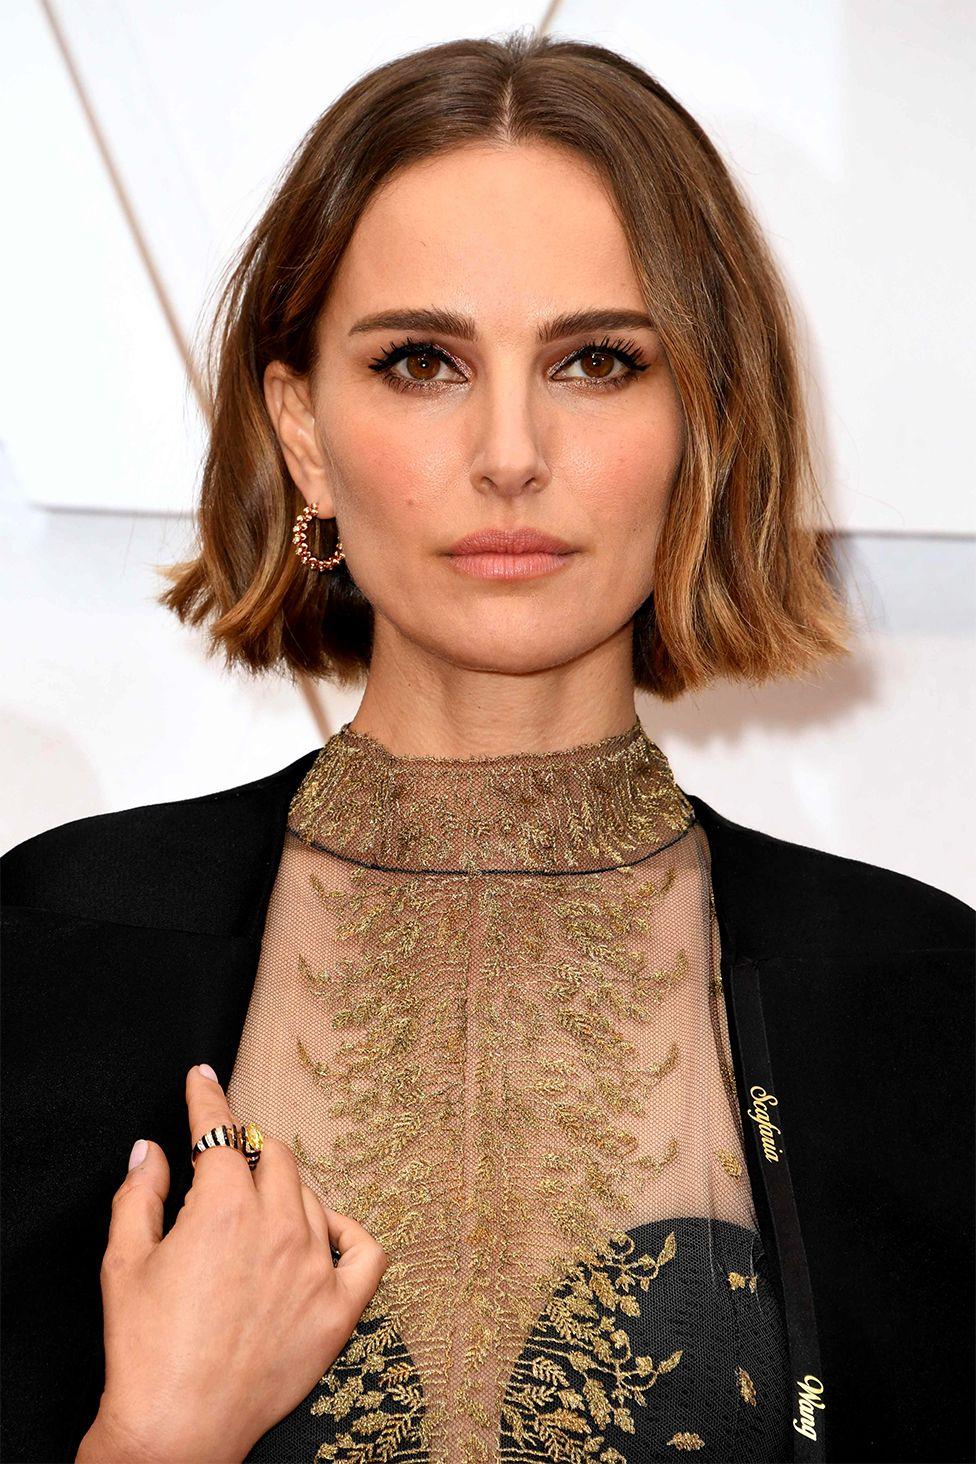 Natalie Portman on the red carpet